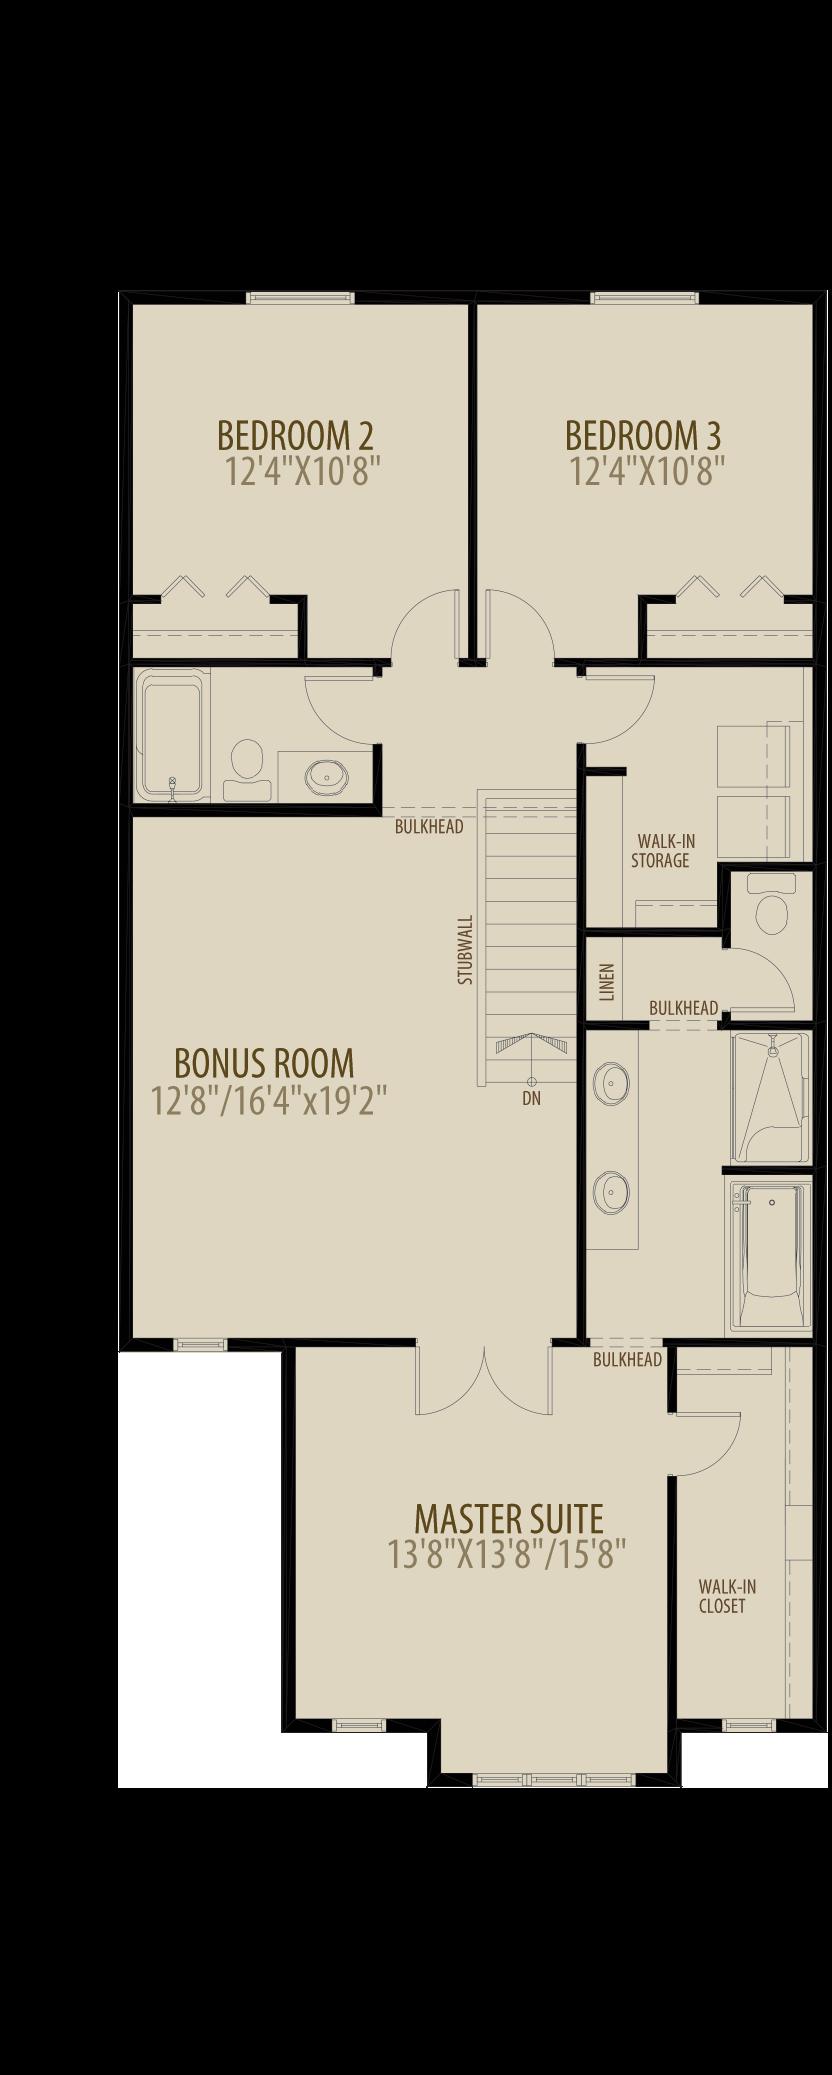 Revised Upper Floor 3 adds 50 sq ft